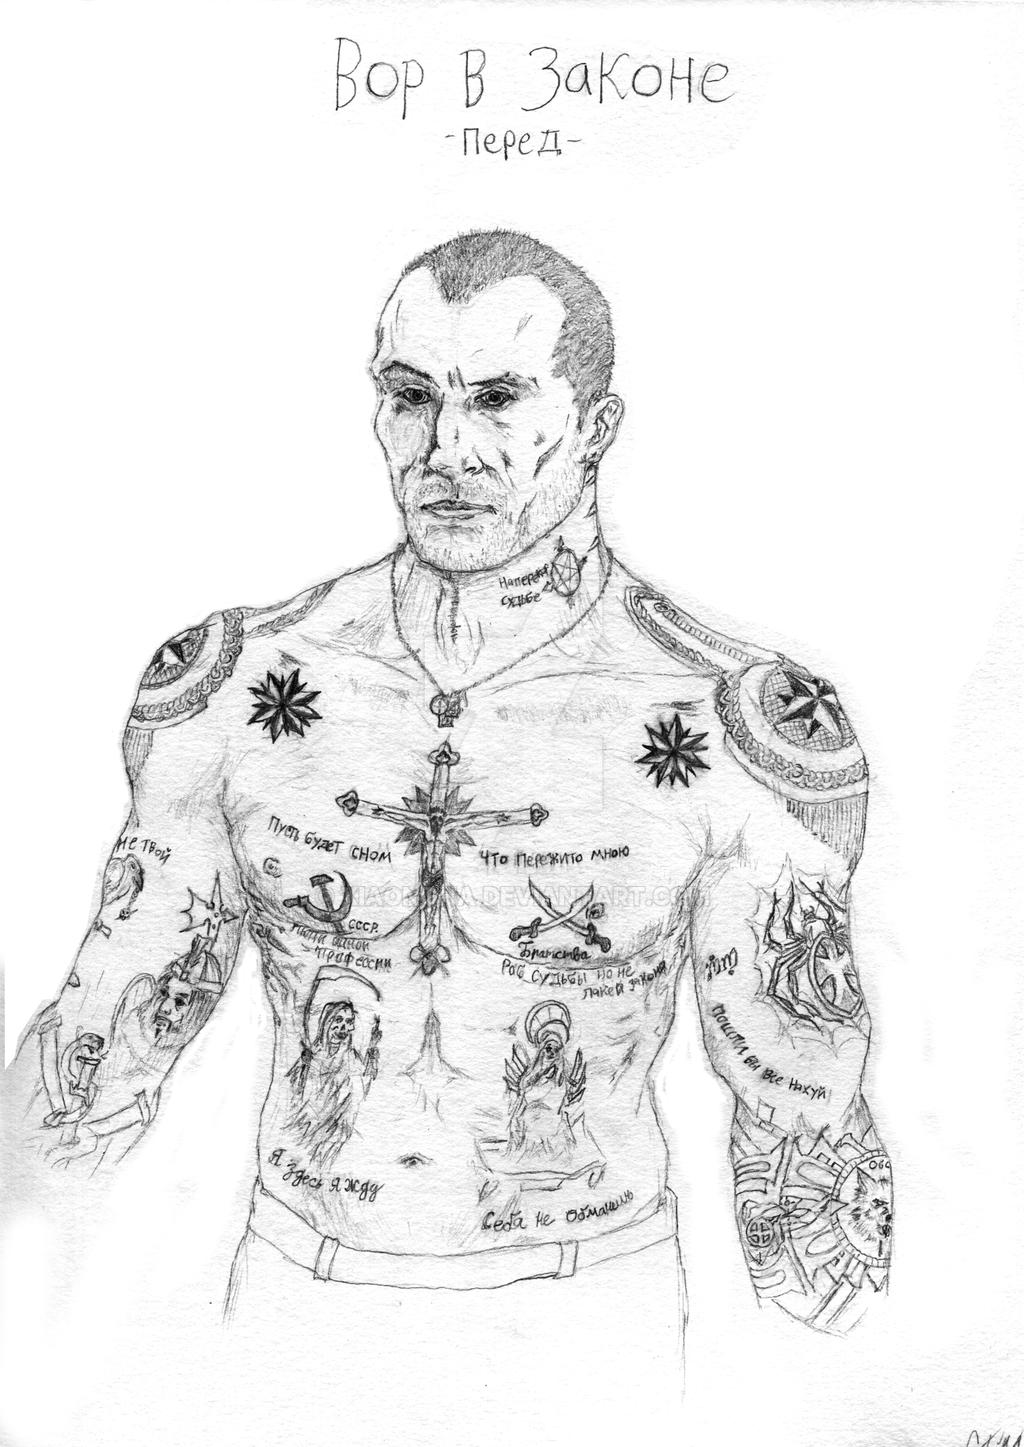 White Tara Hi Res 354407248 moreover Scar S Tattoo FMA 137365790 likewise Berliner Baer likewise Sagitario 314791147 in addition 31764 1. on tattoo wallpaper